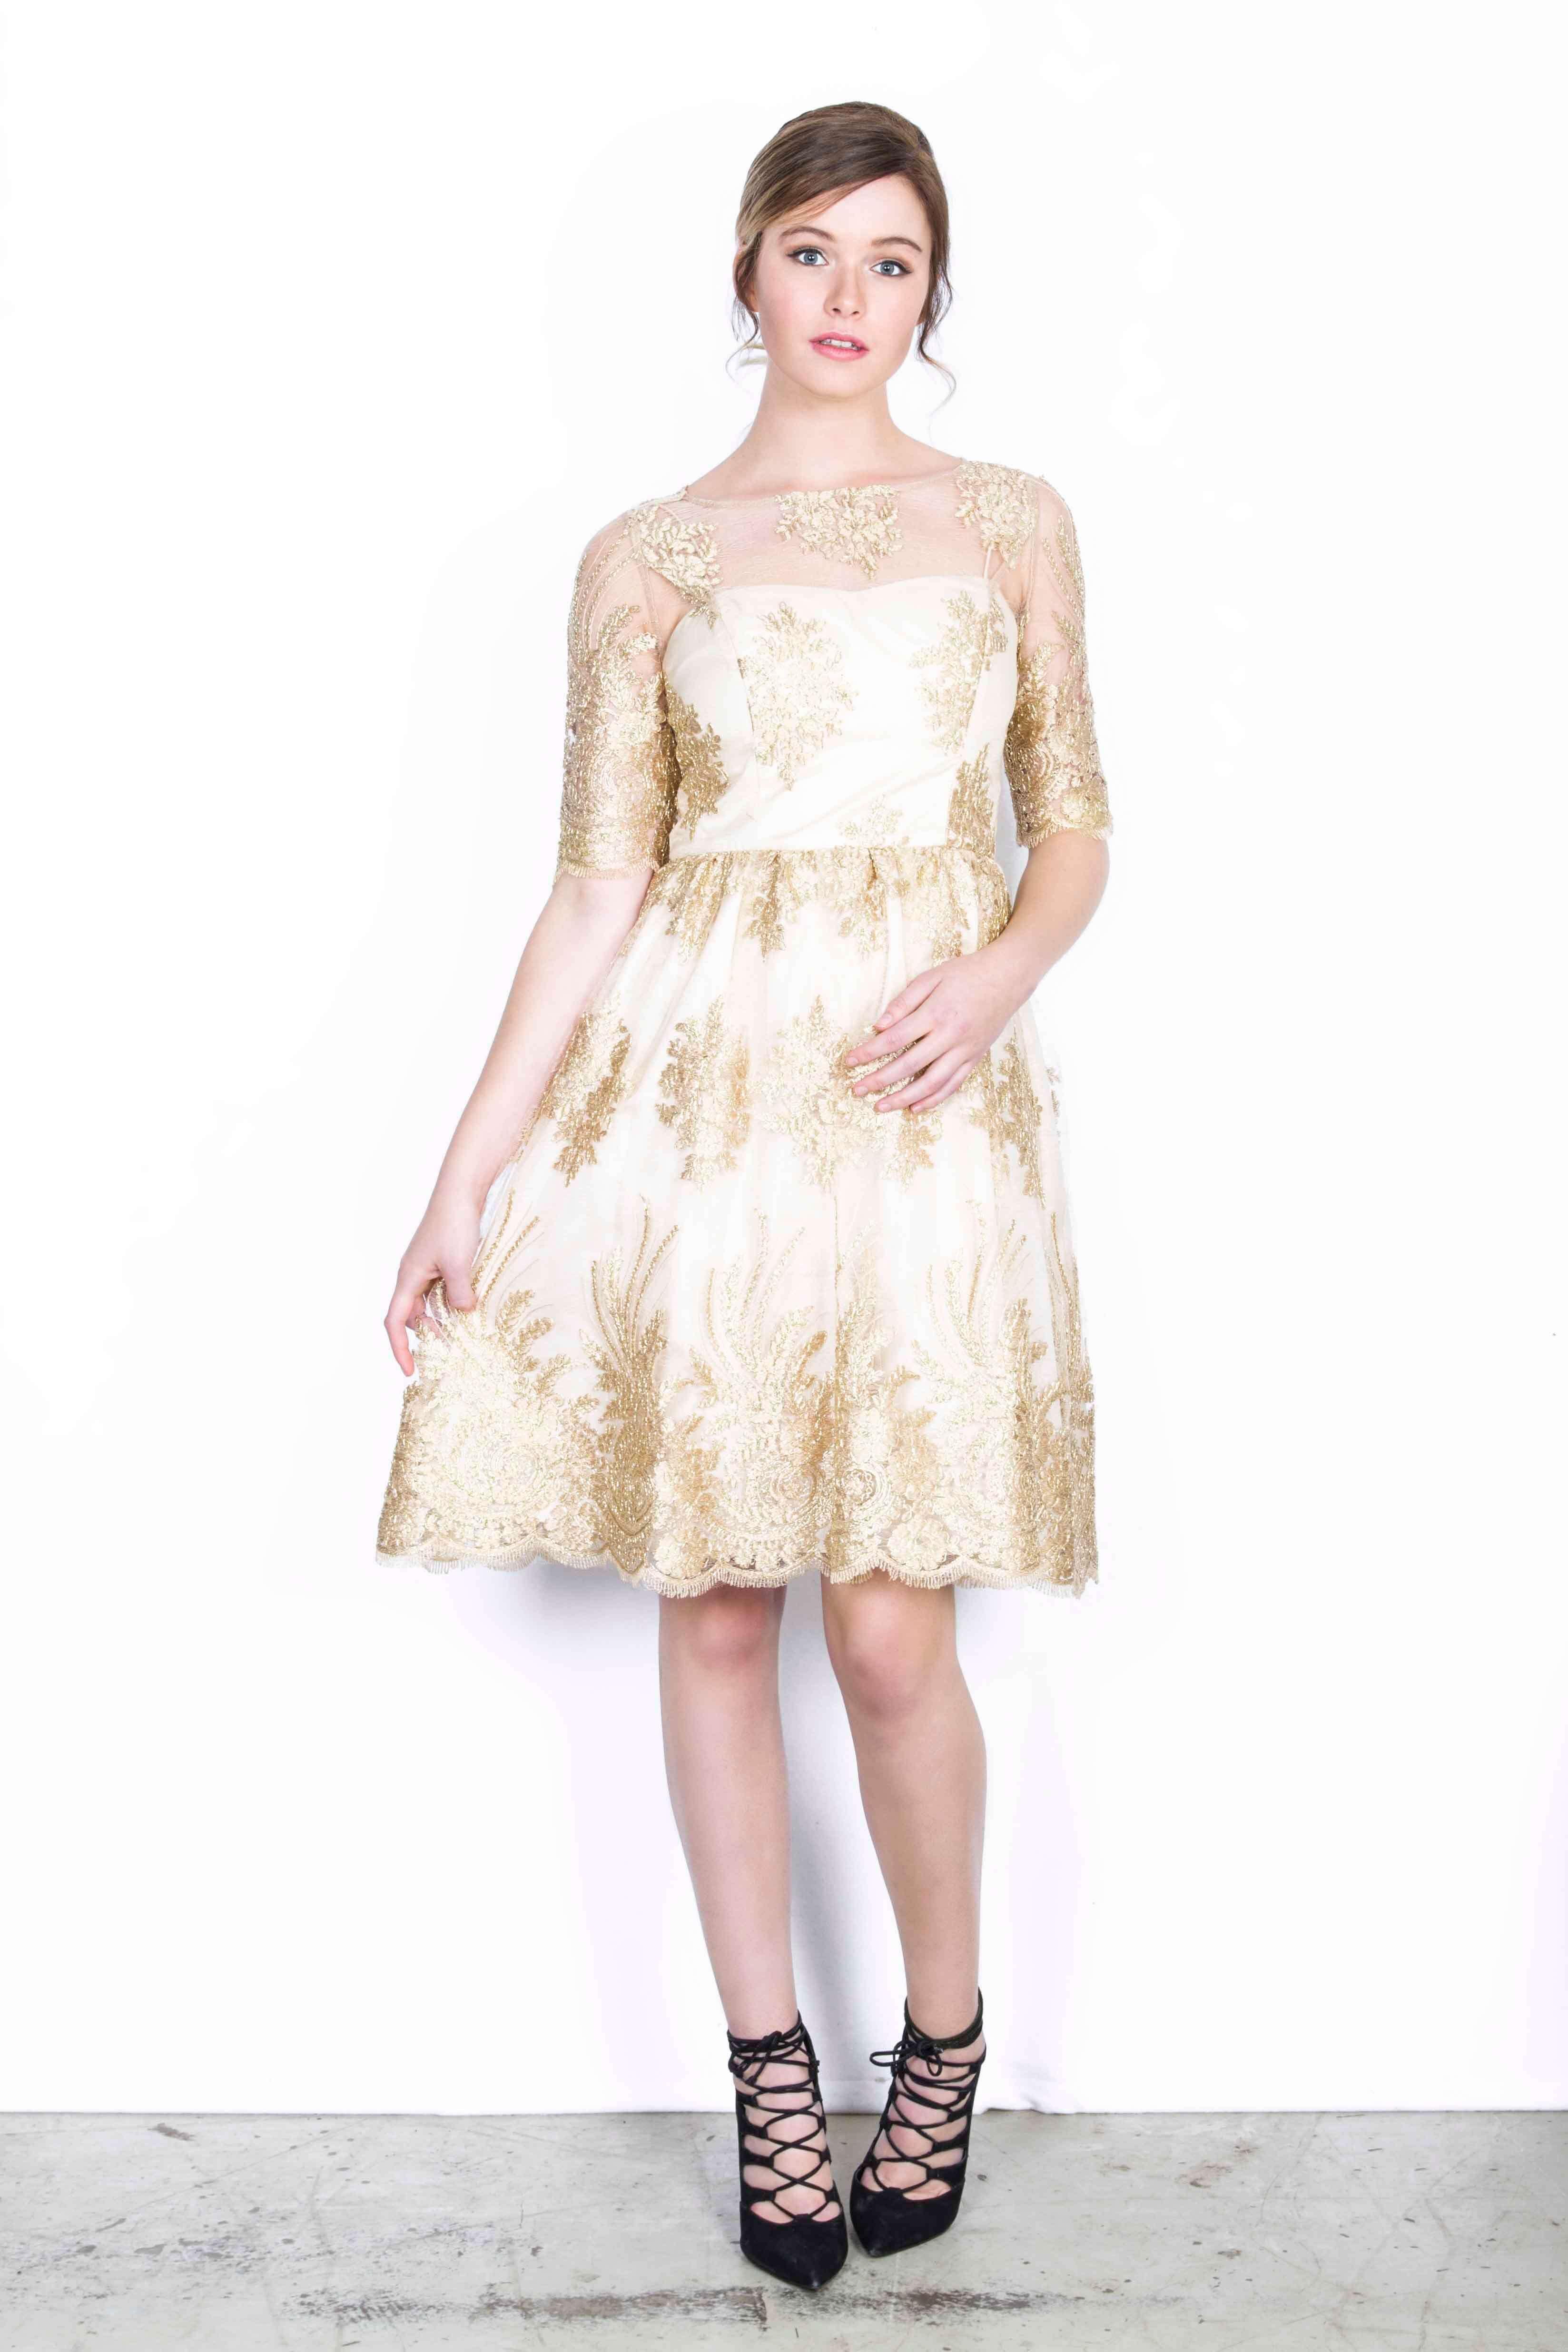 Jurken Huren. Adrianna Papell. Golden Glow. Midi dress. 3/4 sleeves. Golden details. Lace Dress. Cocktail party. Black tie.